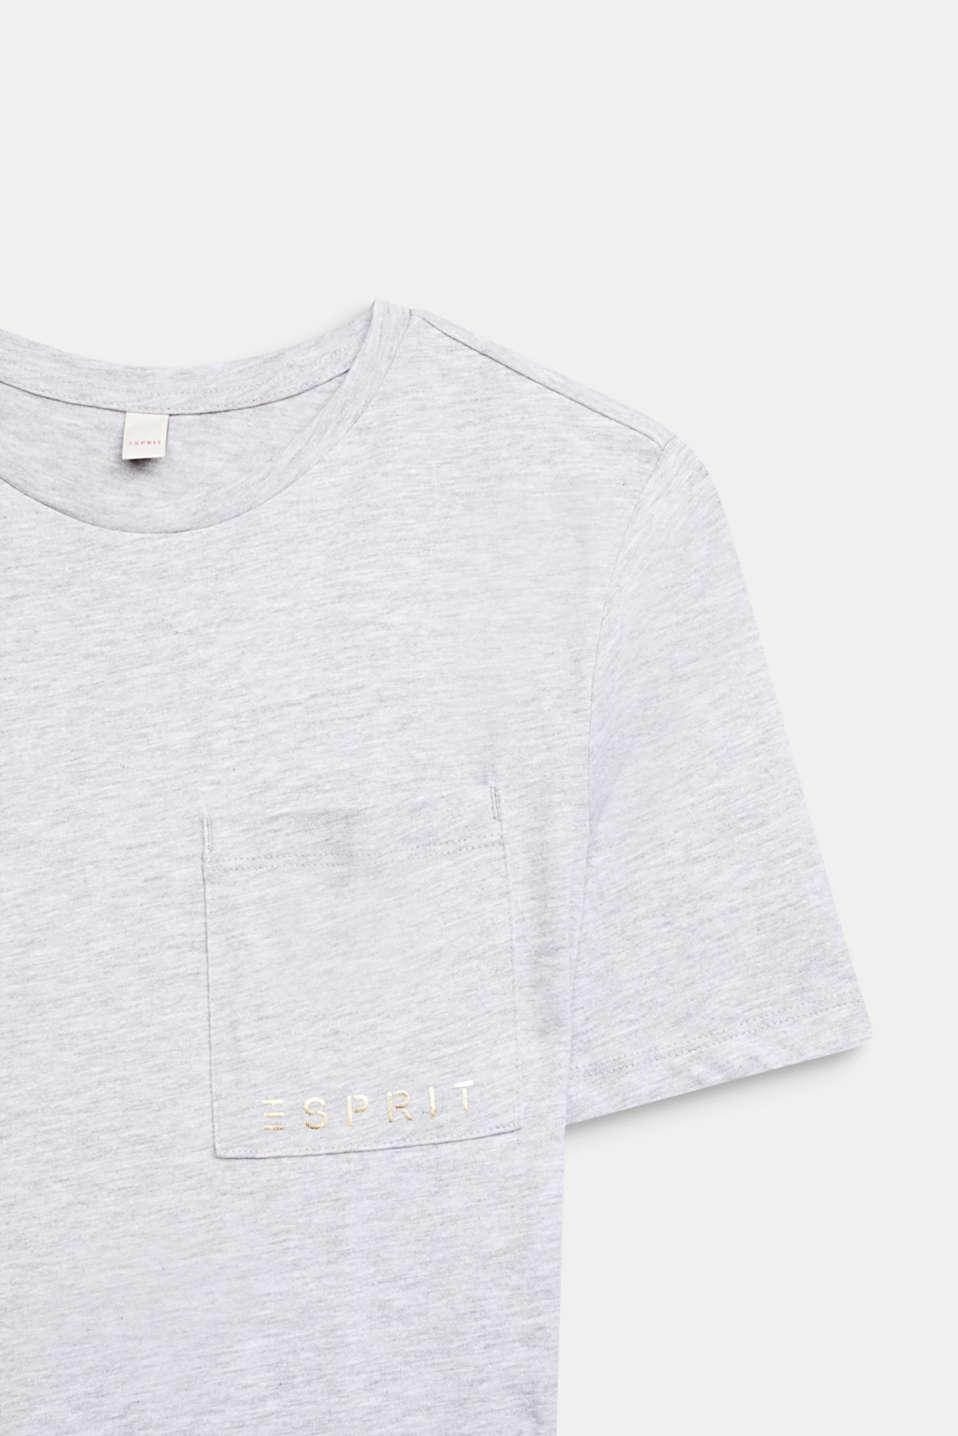 Melange shirt dress made of jersey, LCHEATHER SILVER, detail image number 2